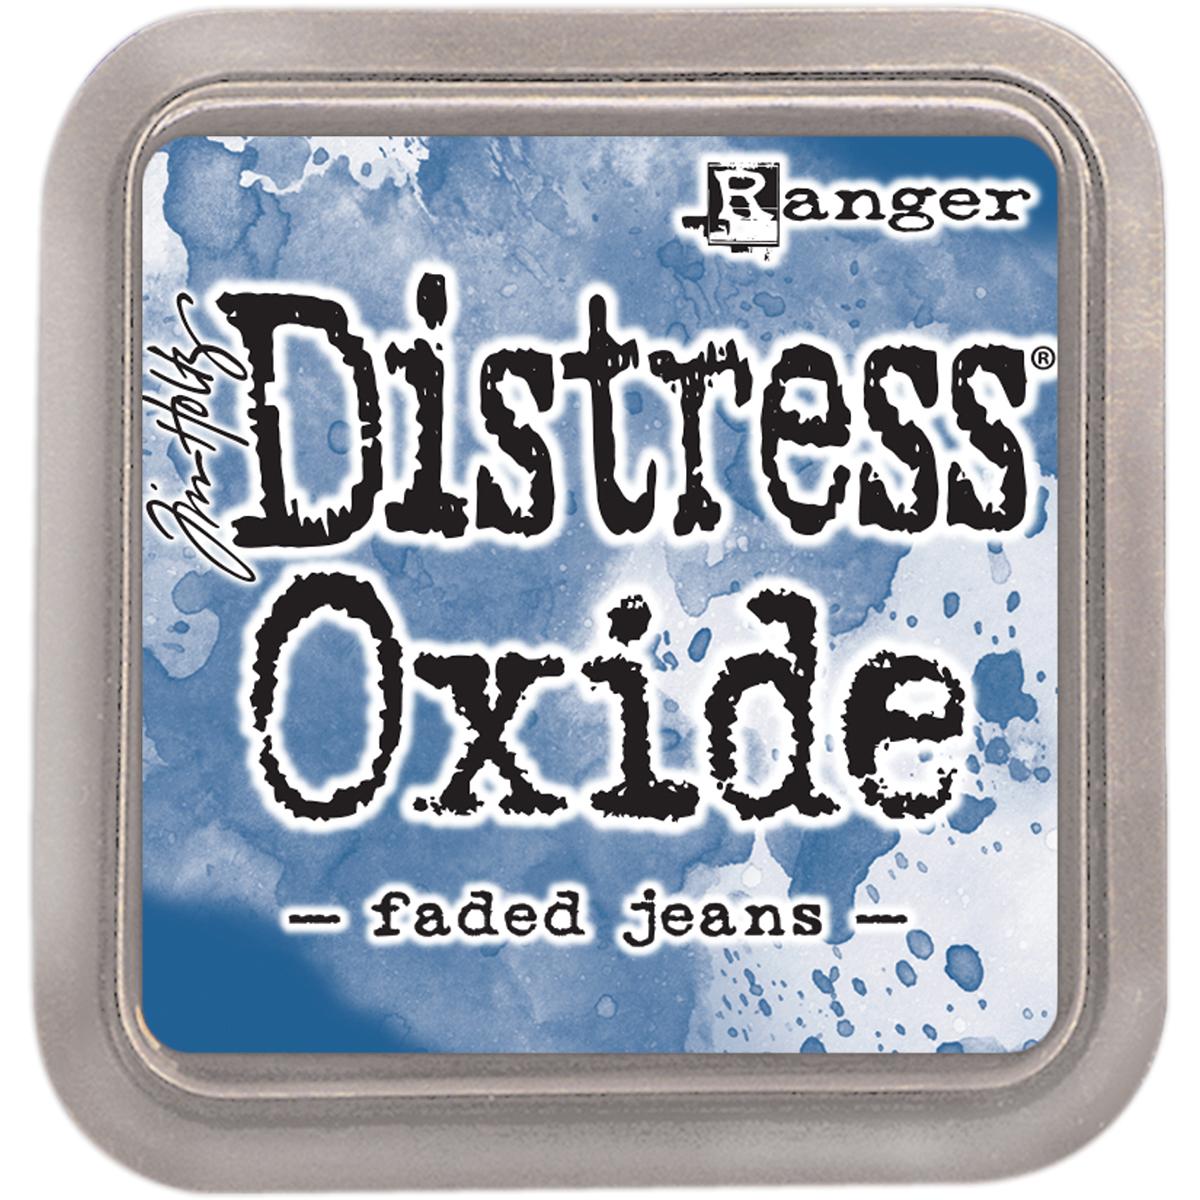 Tim Holtz Distress Oxides Ink Pad Faded Jeans